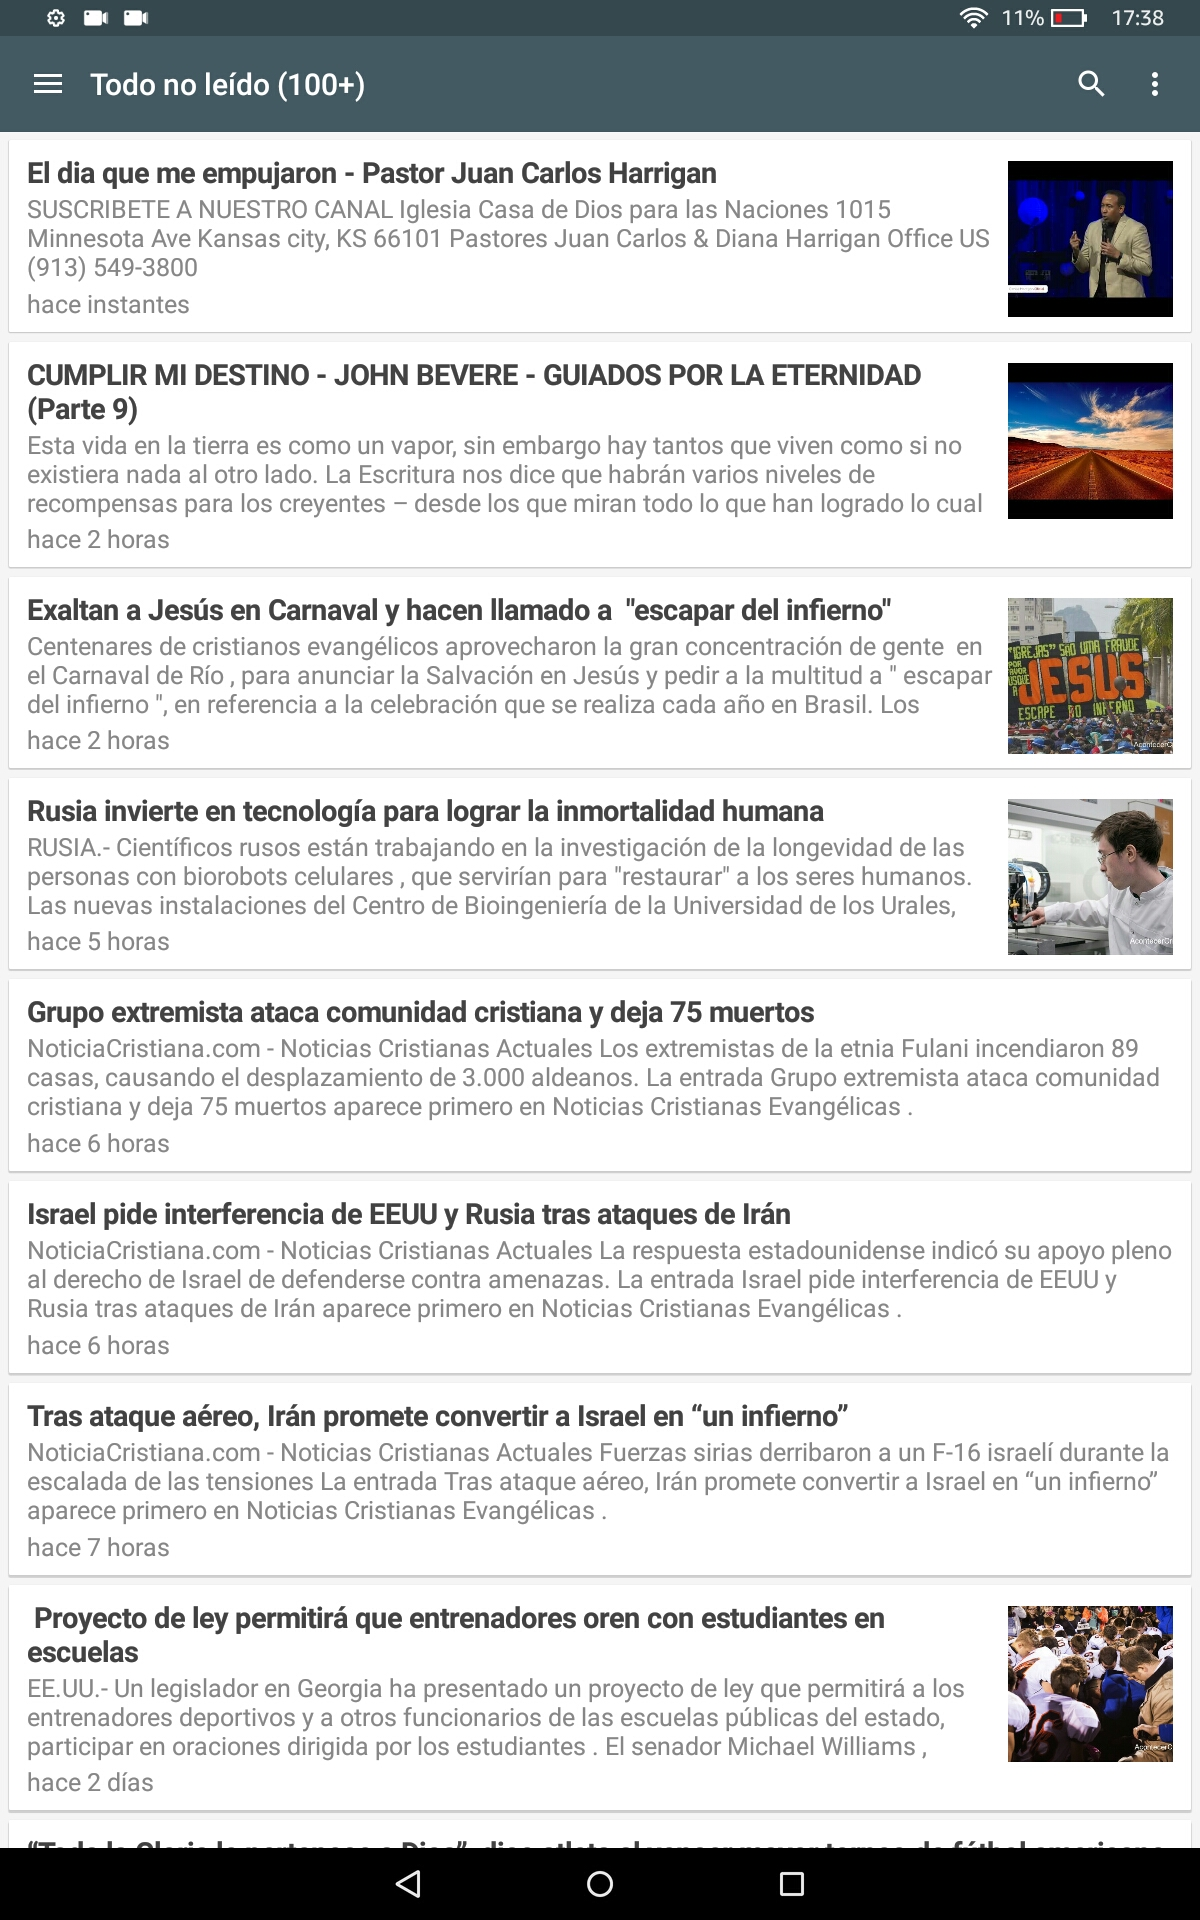 Amazon.com: Iglesia Rey de Gloria: Appstore for Android